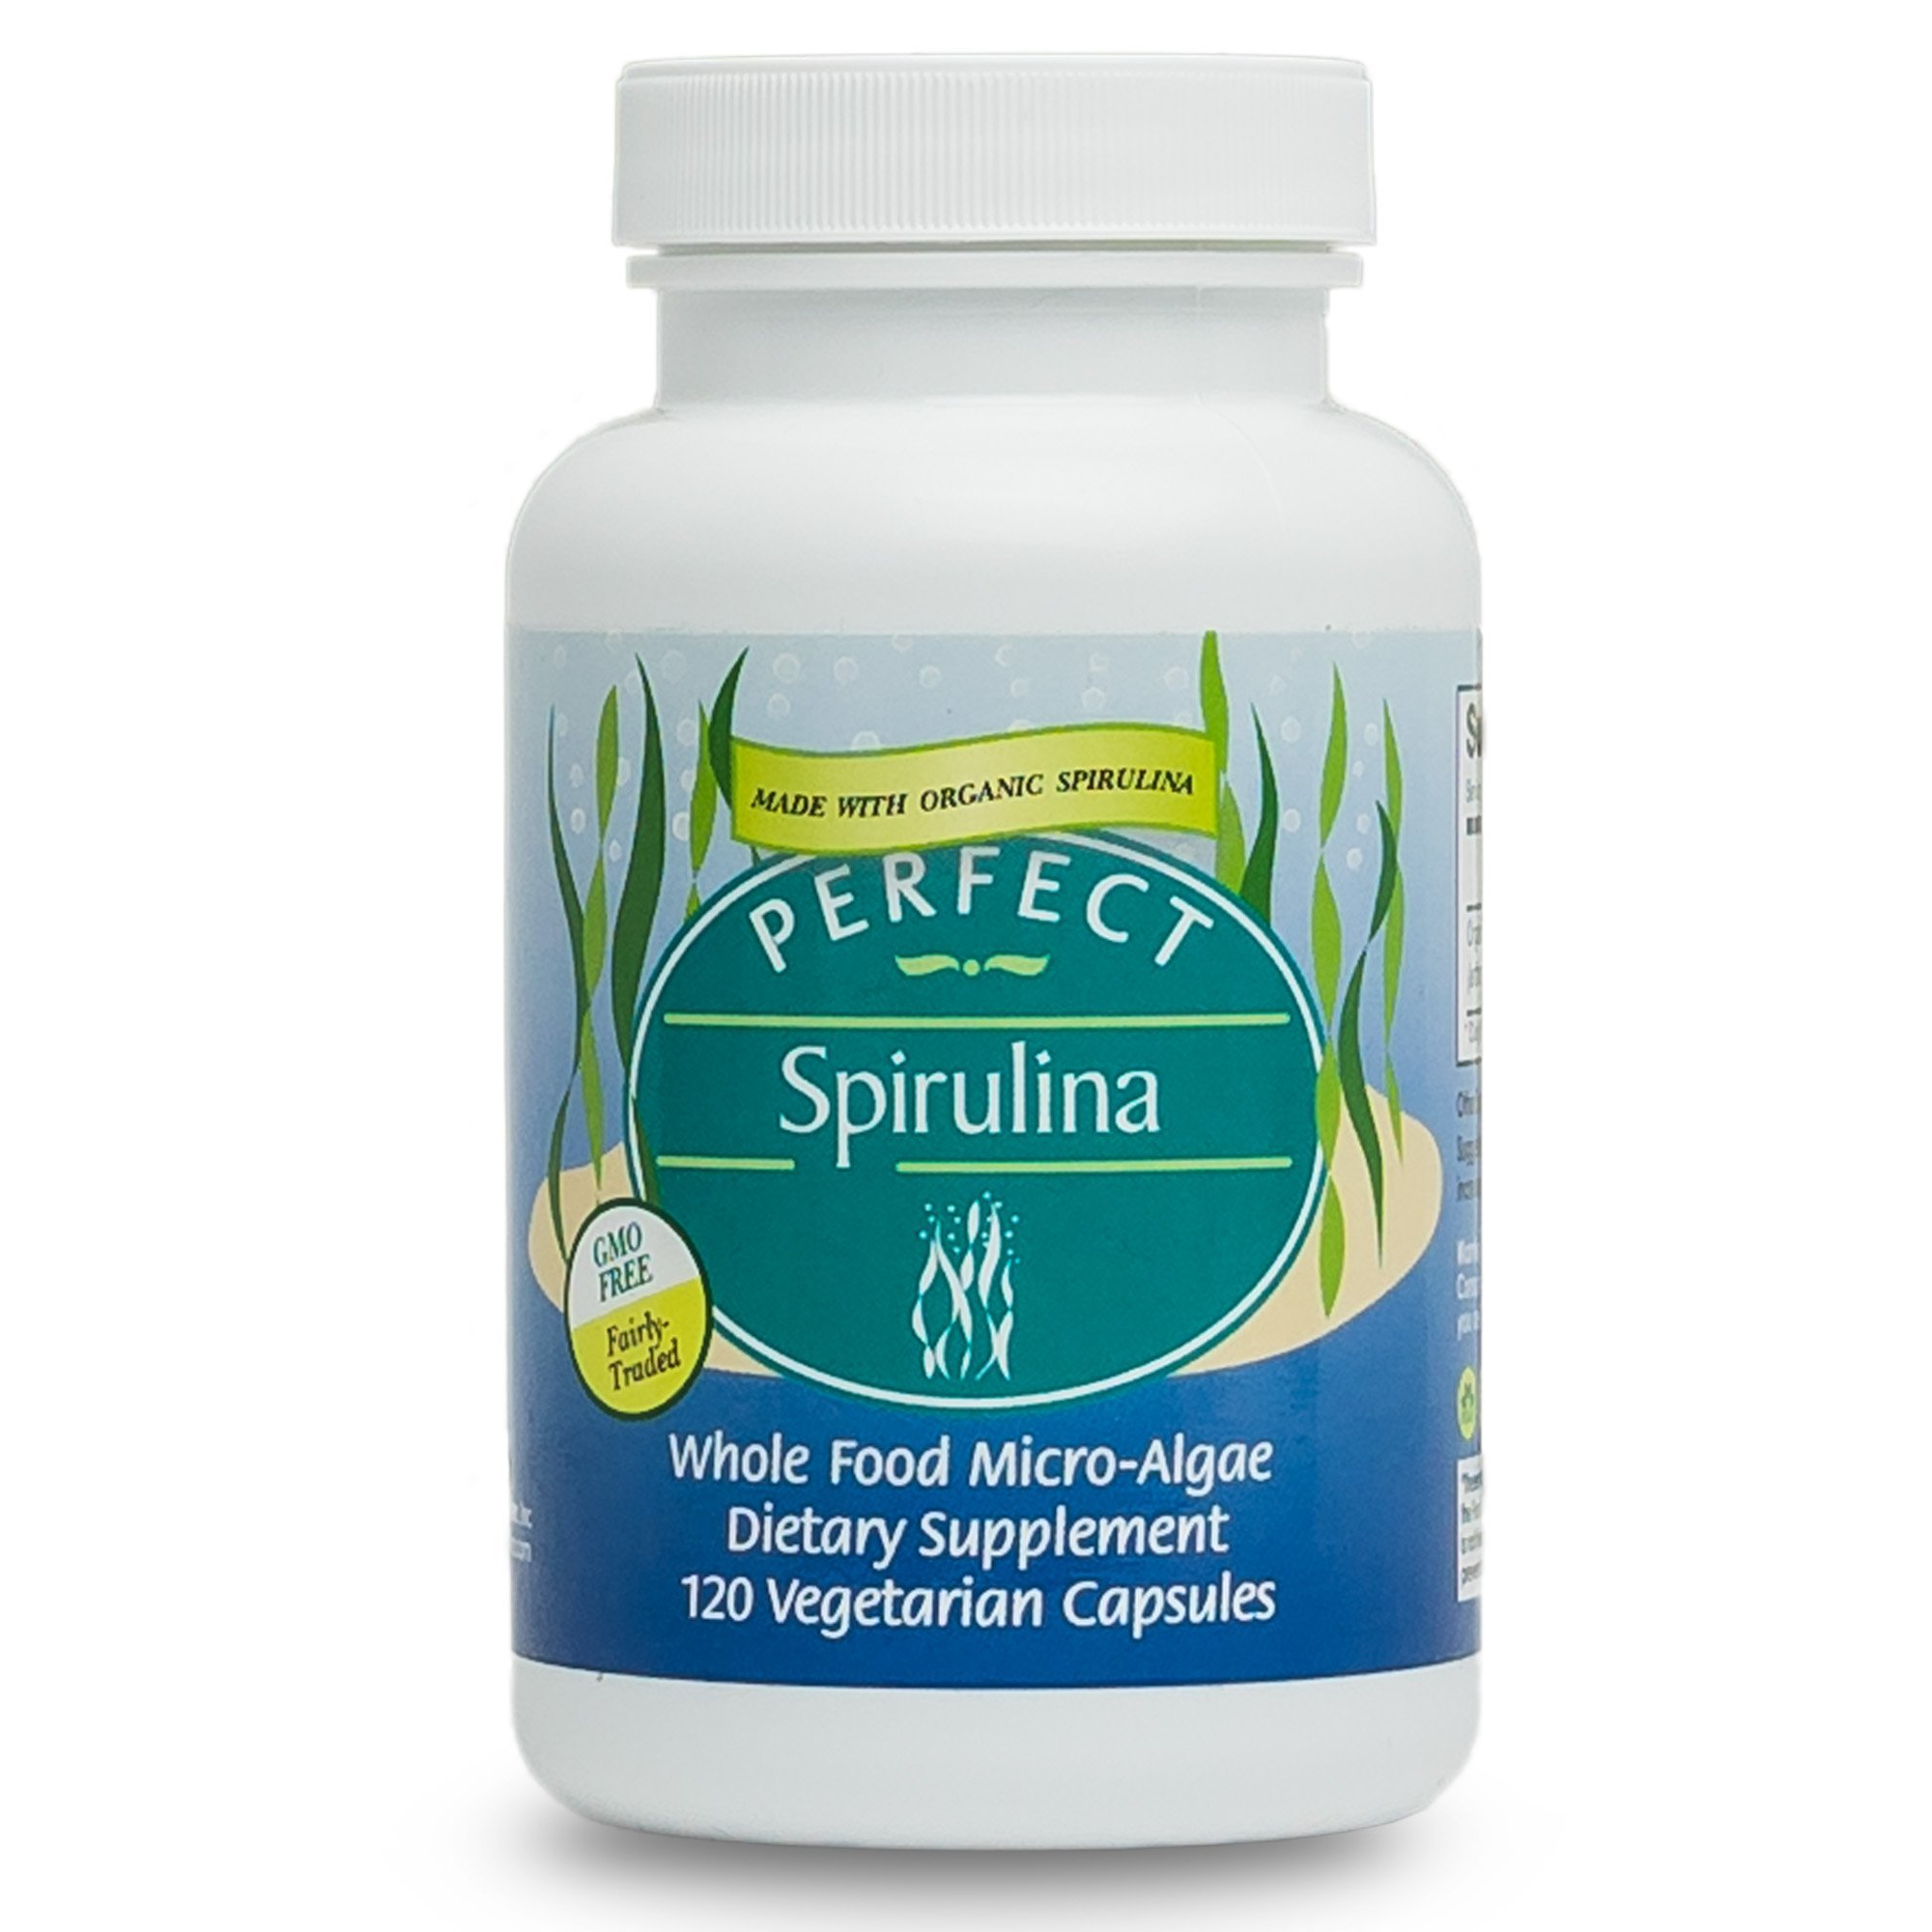 Perfect Supplements Spirulina Capsules - Certified Raw, USDA Organic, Fairly-Traded Spirulina - Whole Food Micro-Algae - 120 Vegetable Capsules